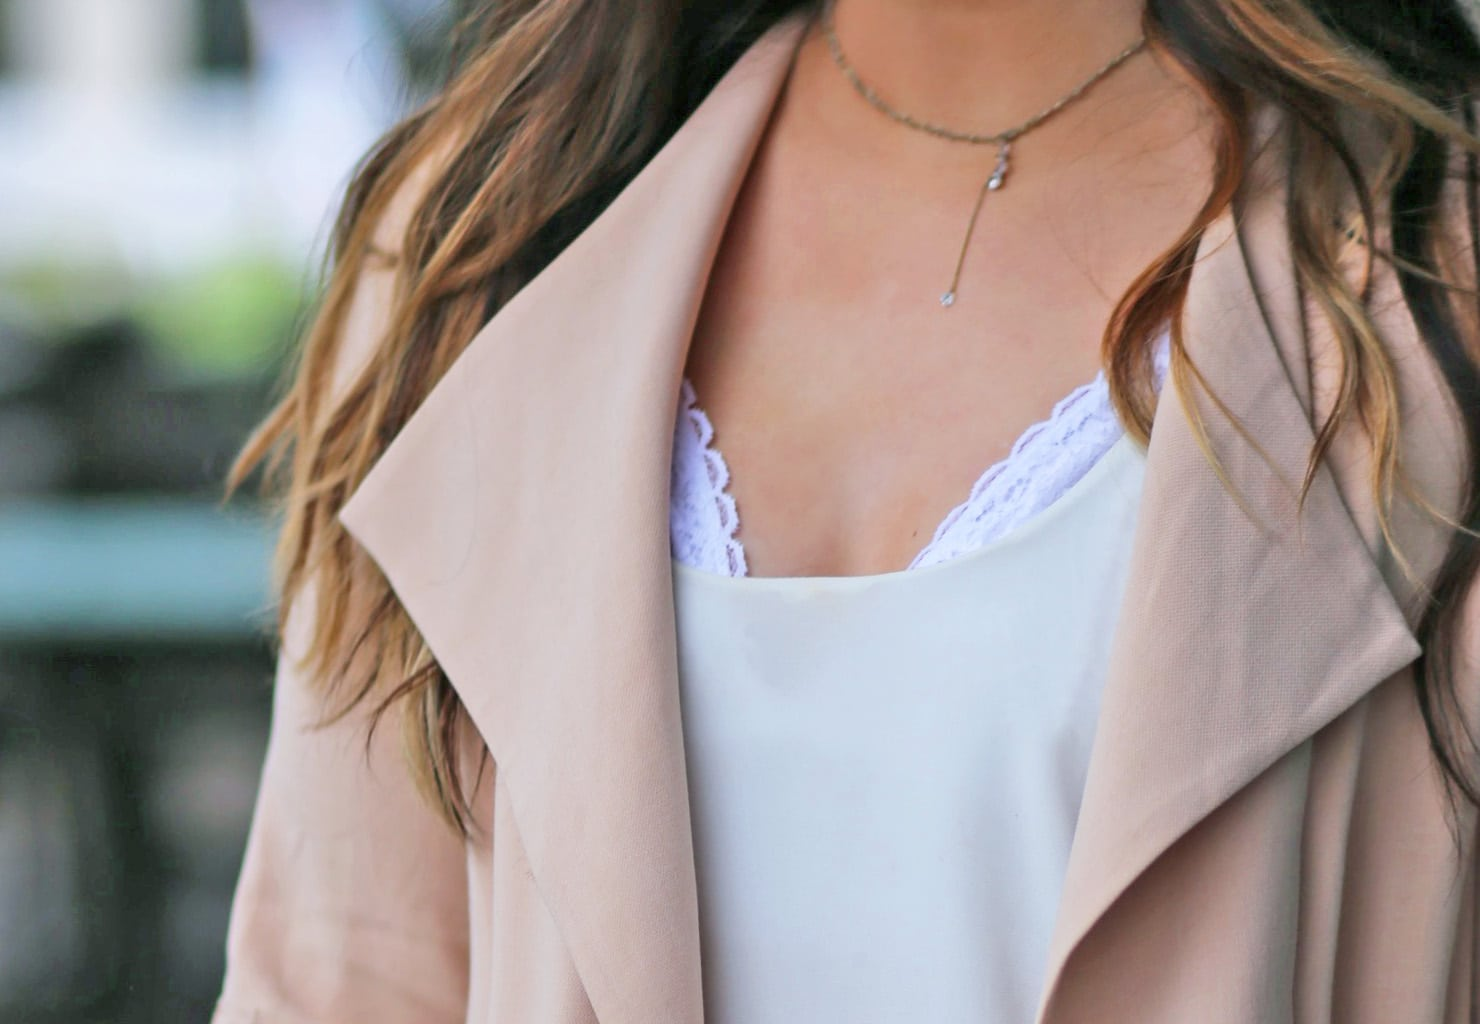 romantic look   pink coat   white shirt   bralettes   kohls   black heels  Mash elle beauty blogger